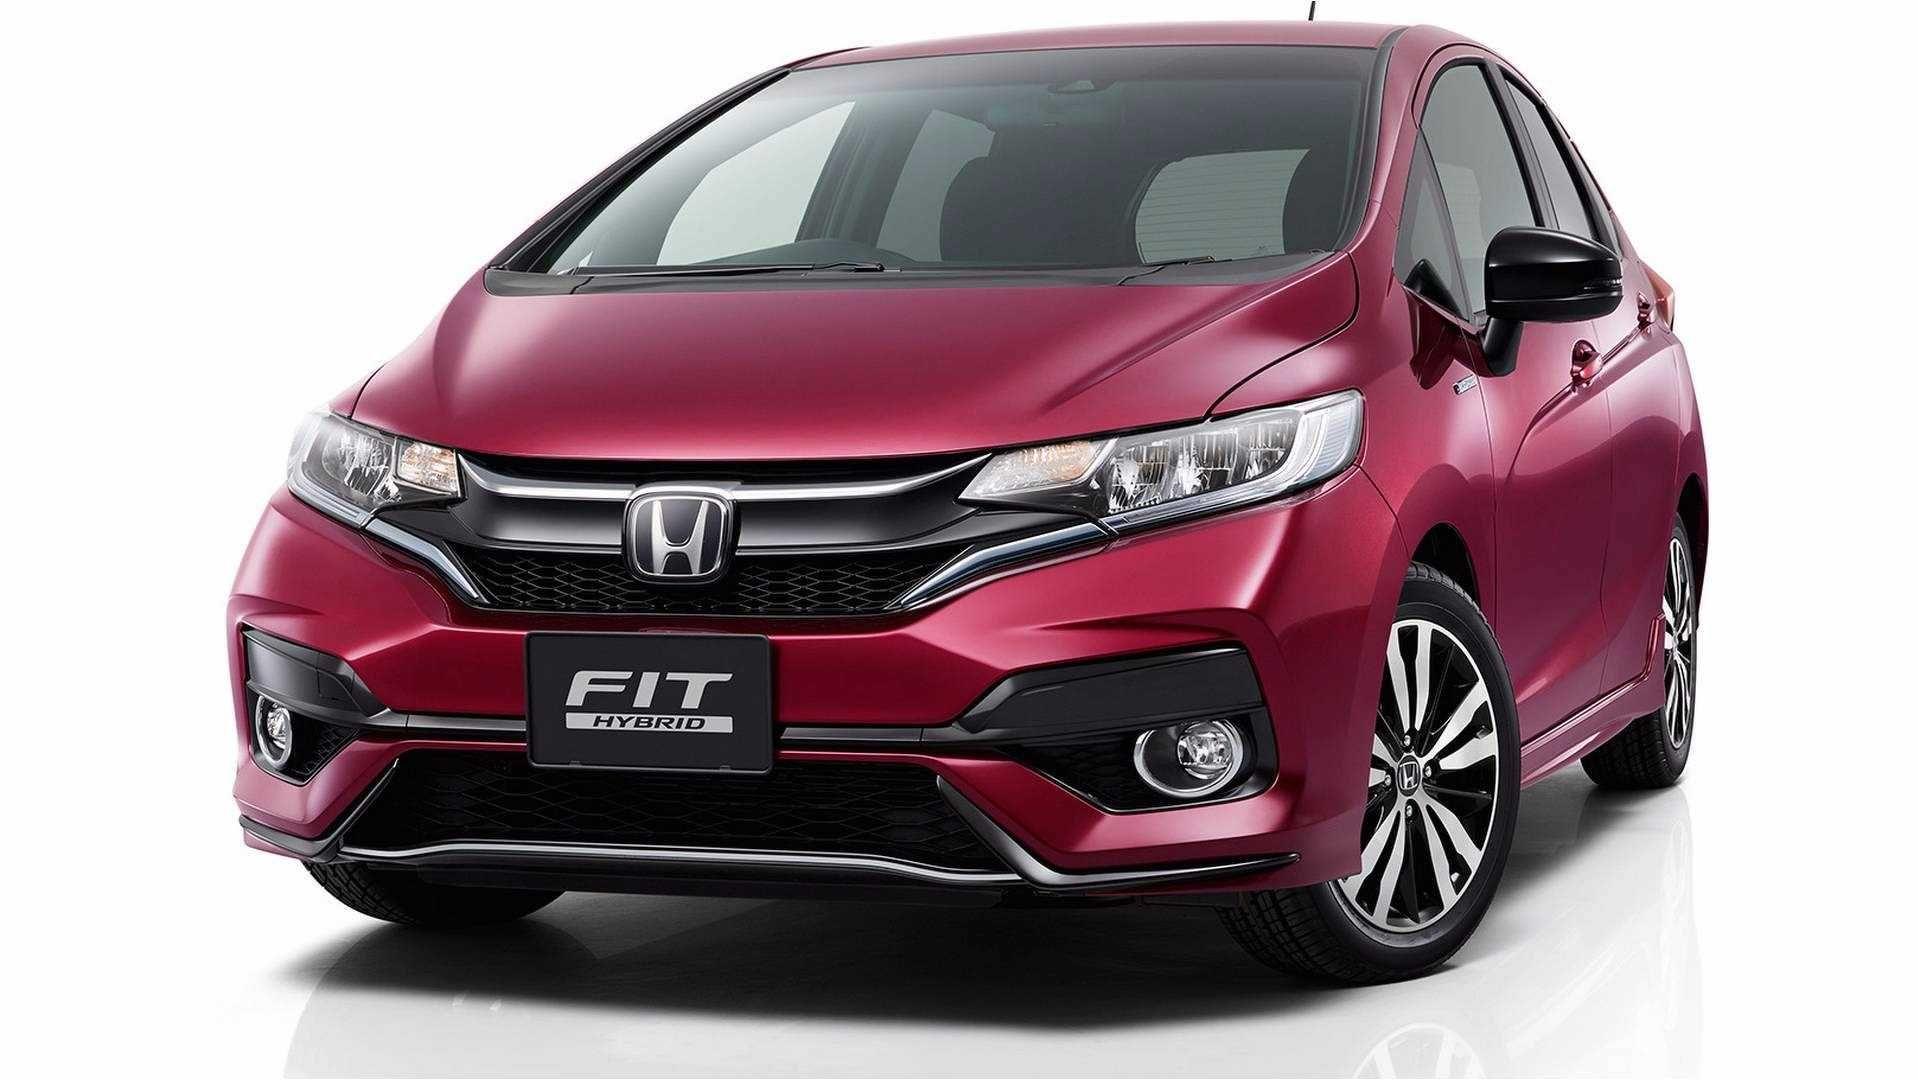 Toyota Vitz 2018 Price In Pakistan Review Full Specs Images